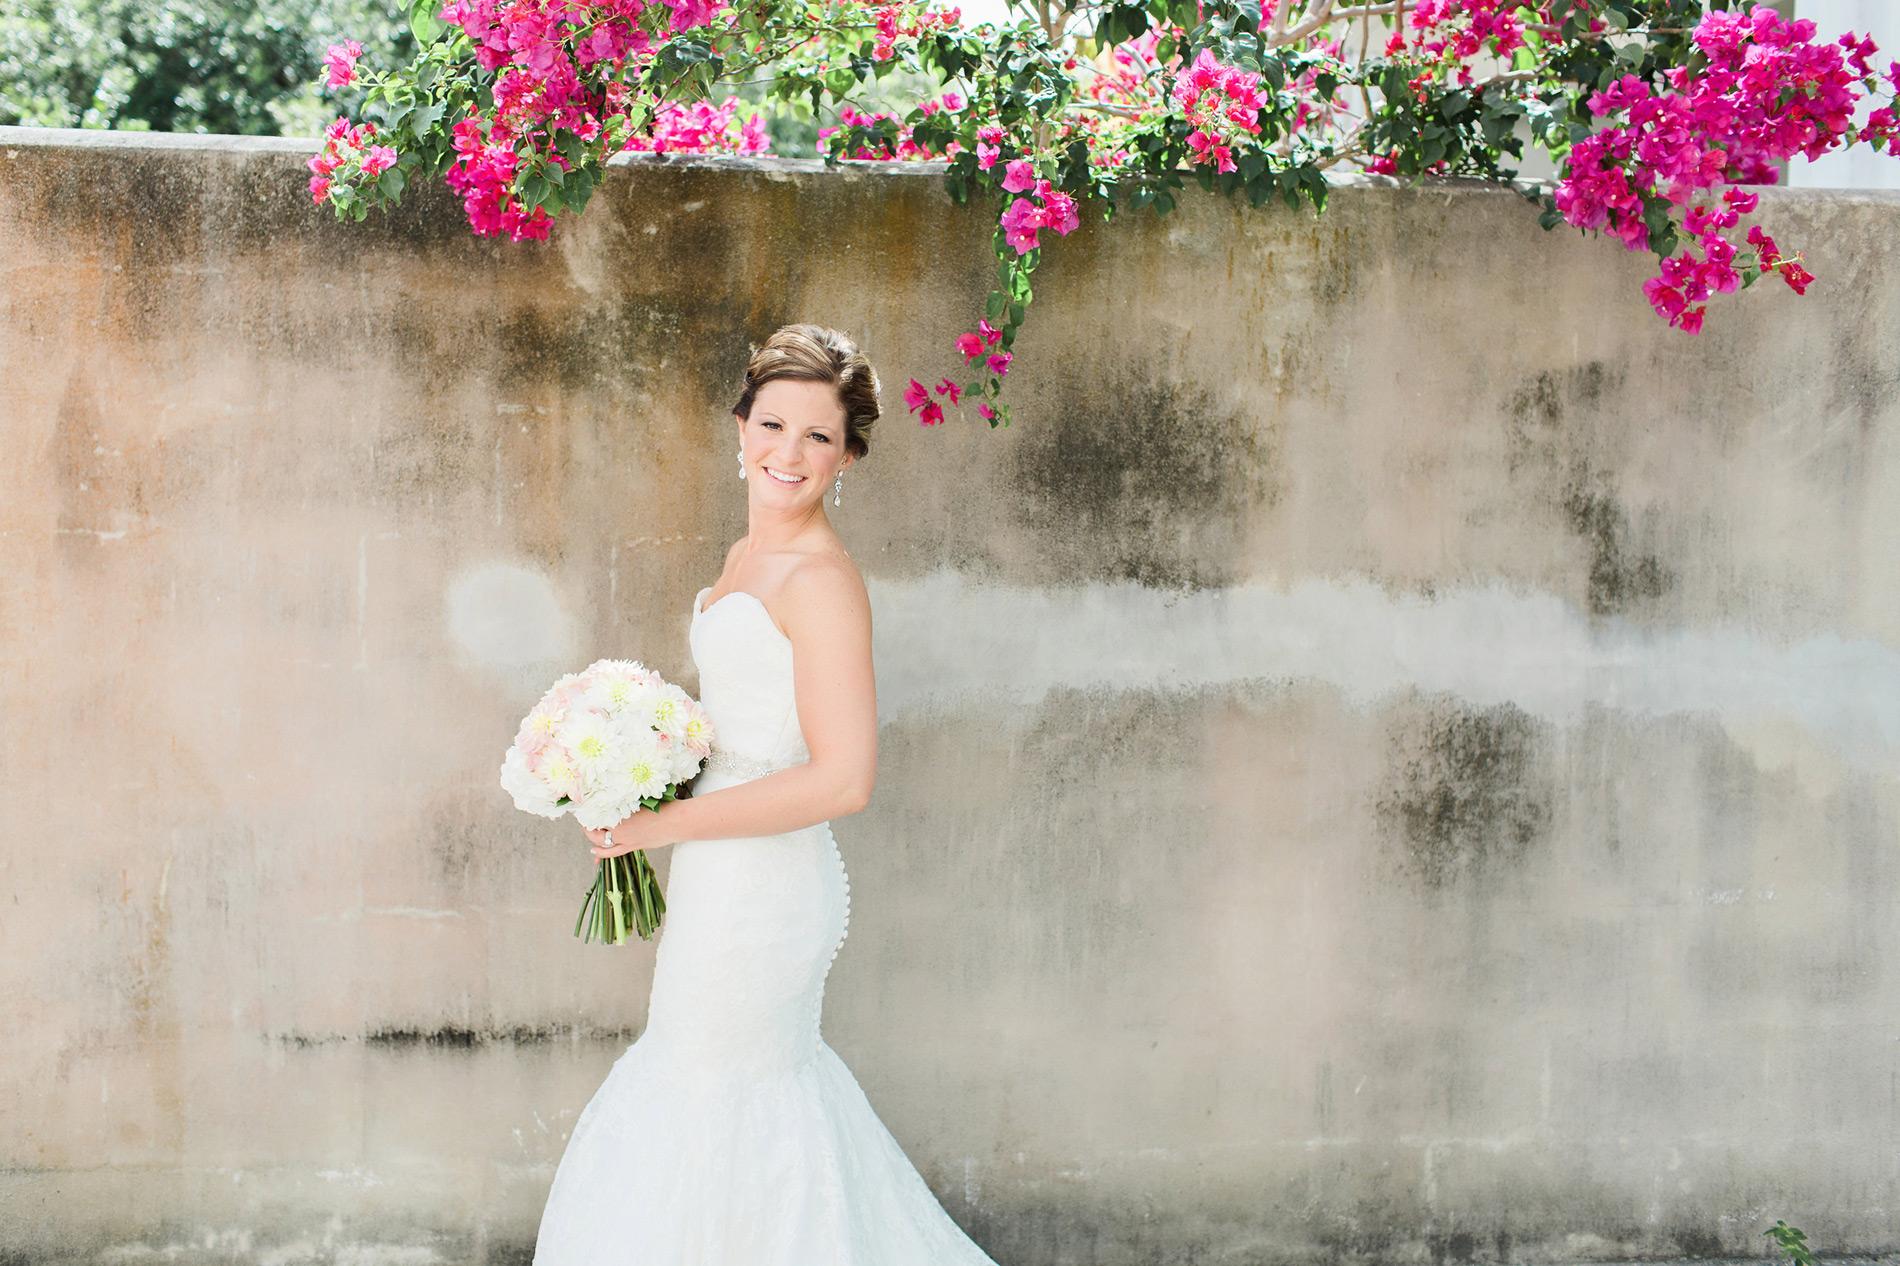 st-augustine-bride-white-room-historic-building